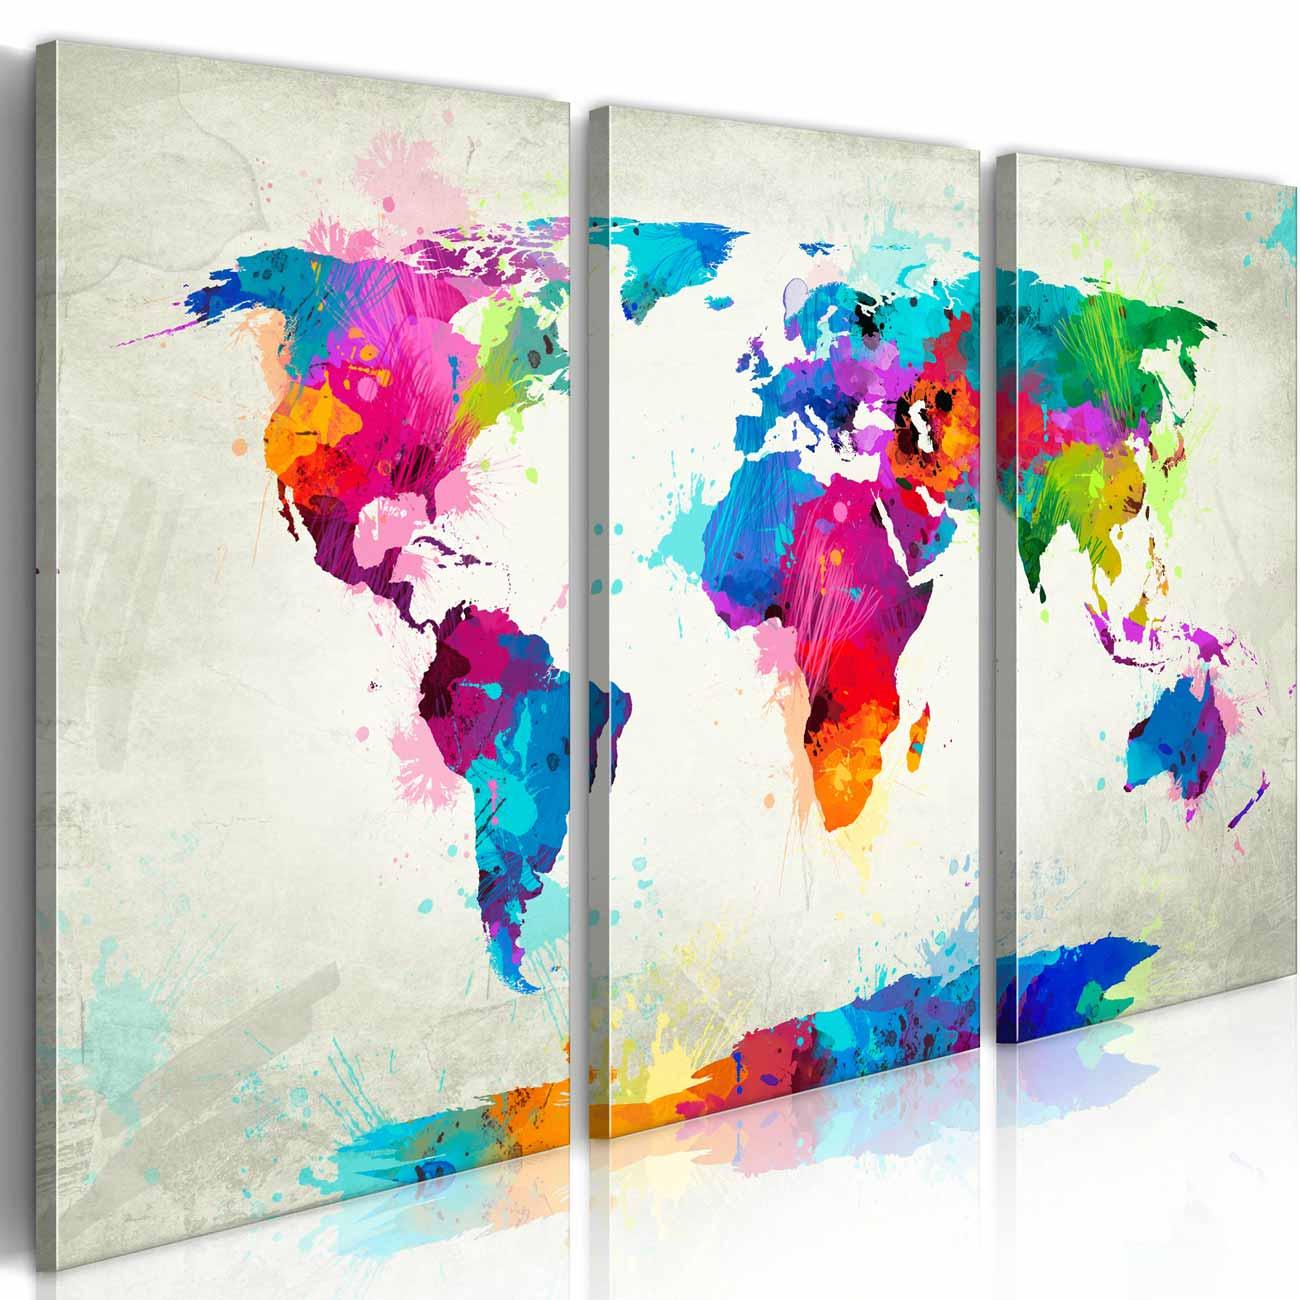 ARTGEIST Verdenskort An Explosion of Colors billede - multifarvet print, 3-delt - Flere størrelser 60x40